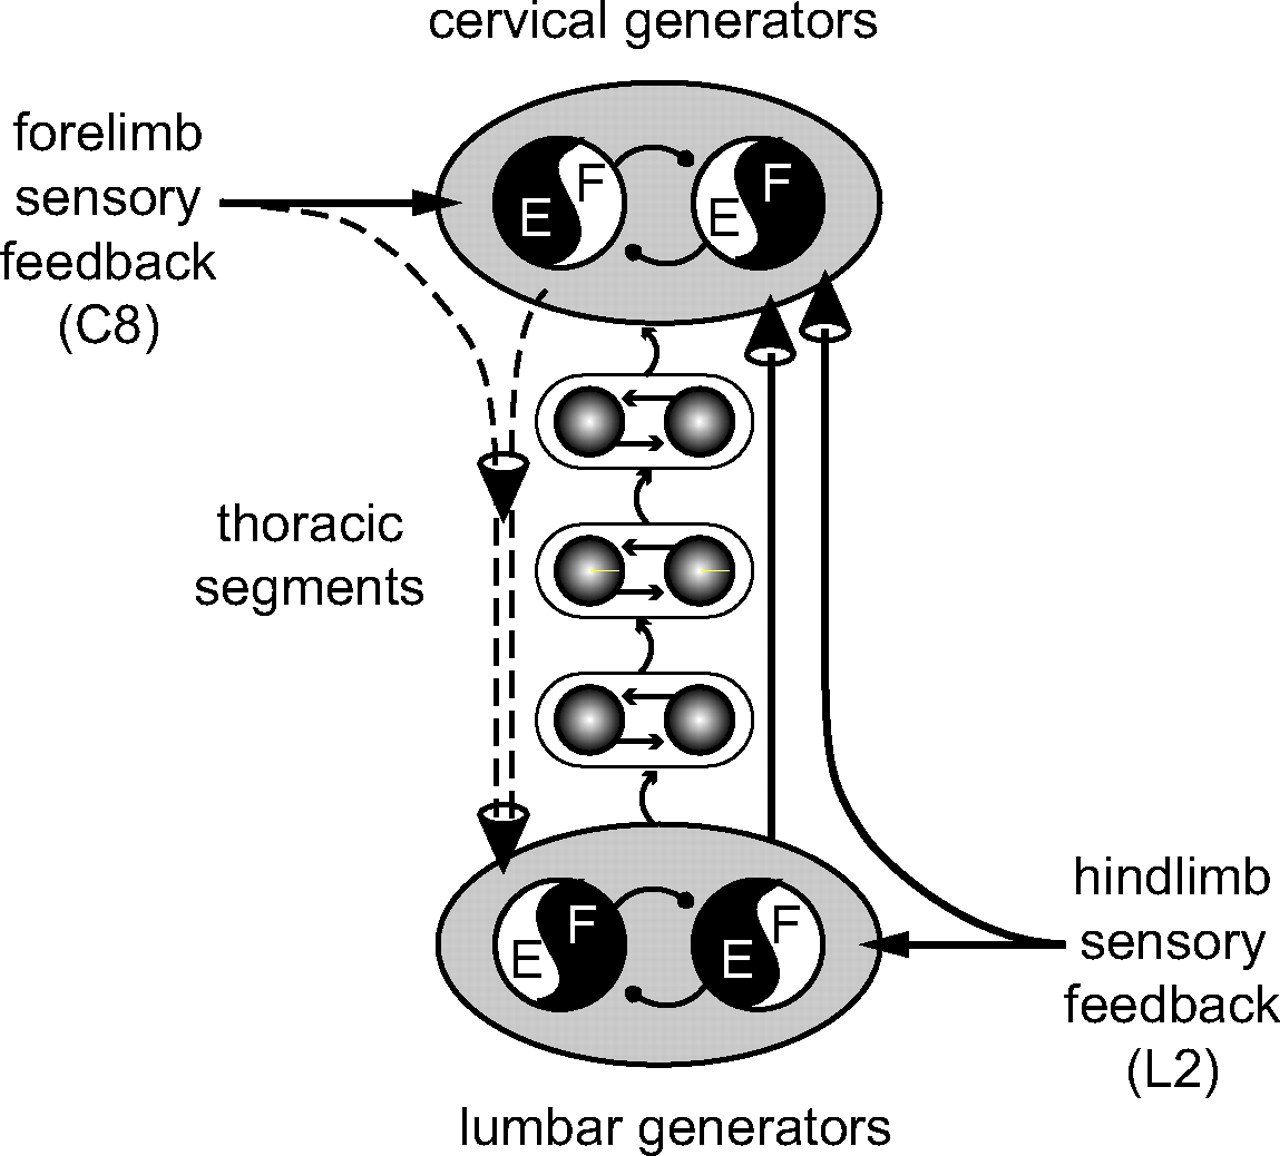 Cervicolumbar Coordination In Mammalian Quadrupedal